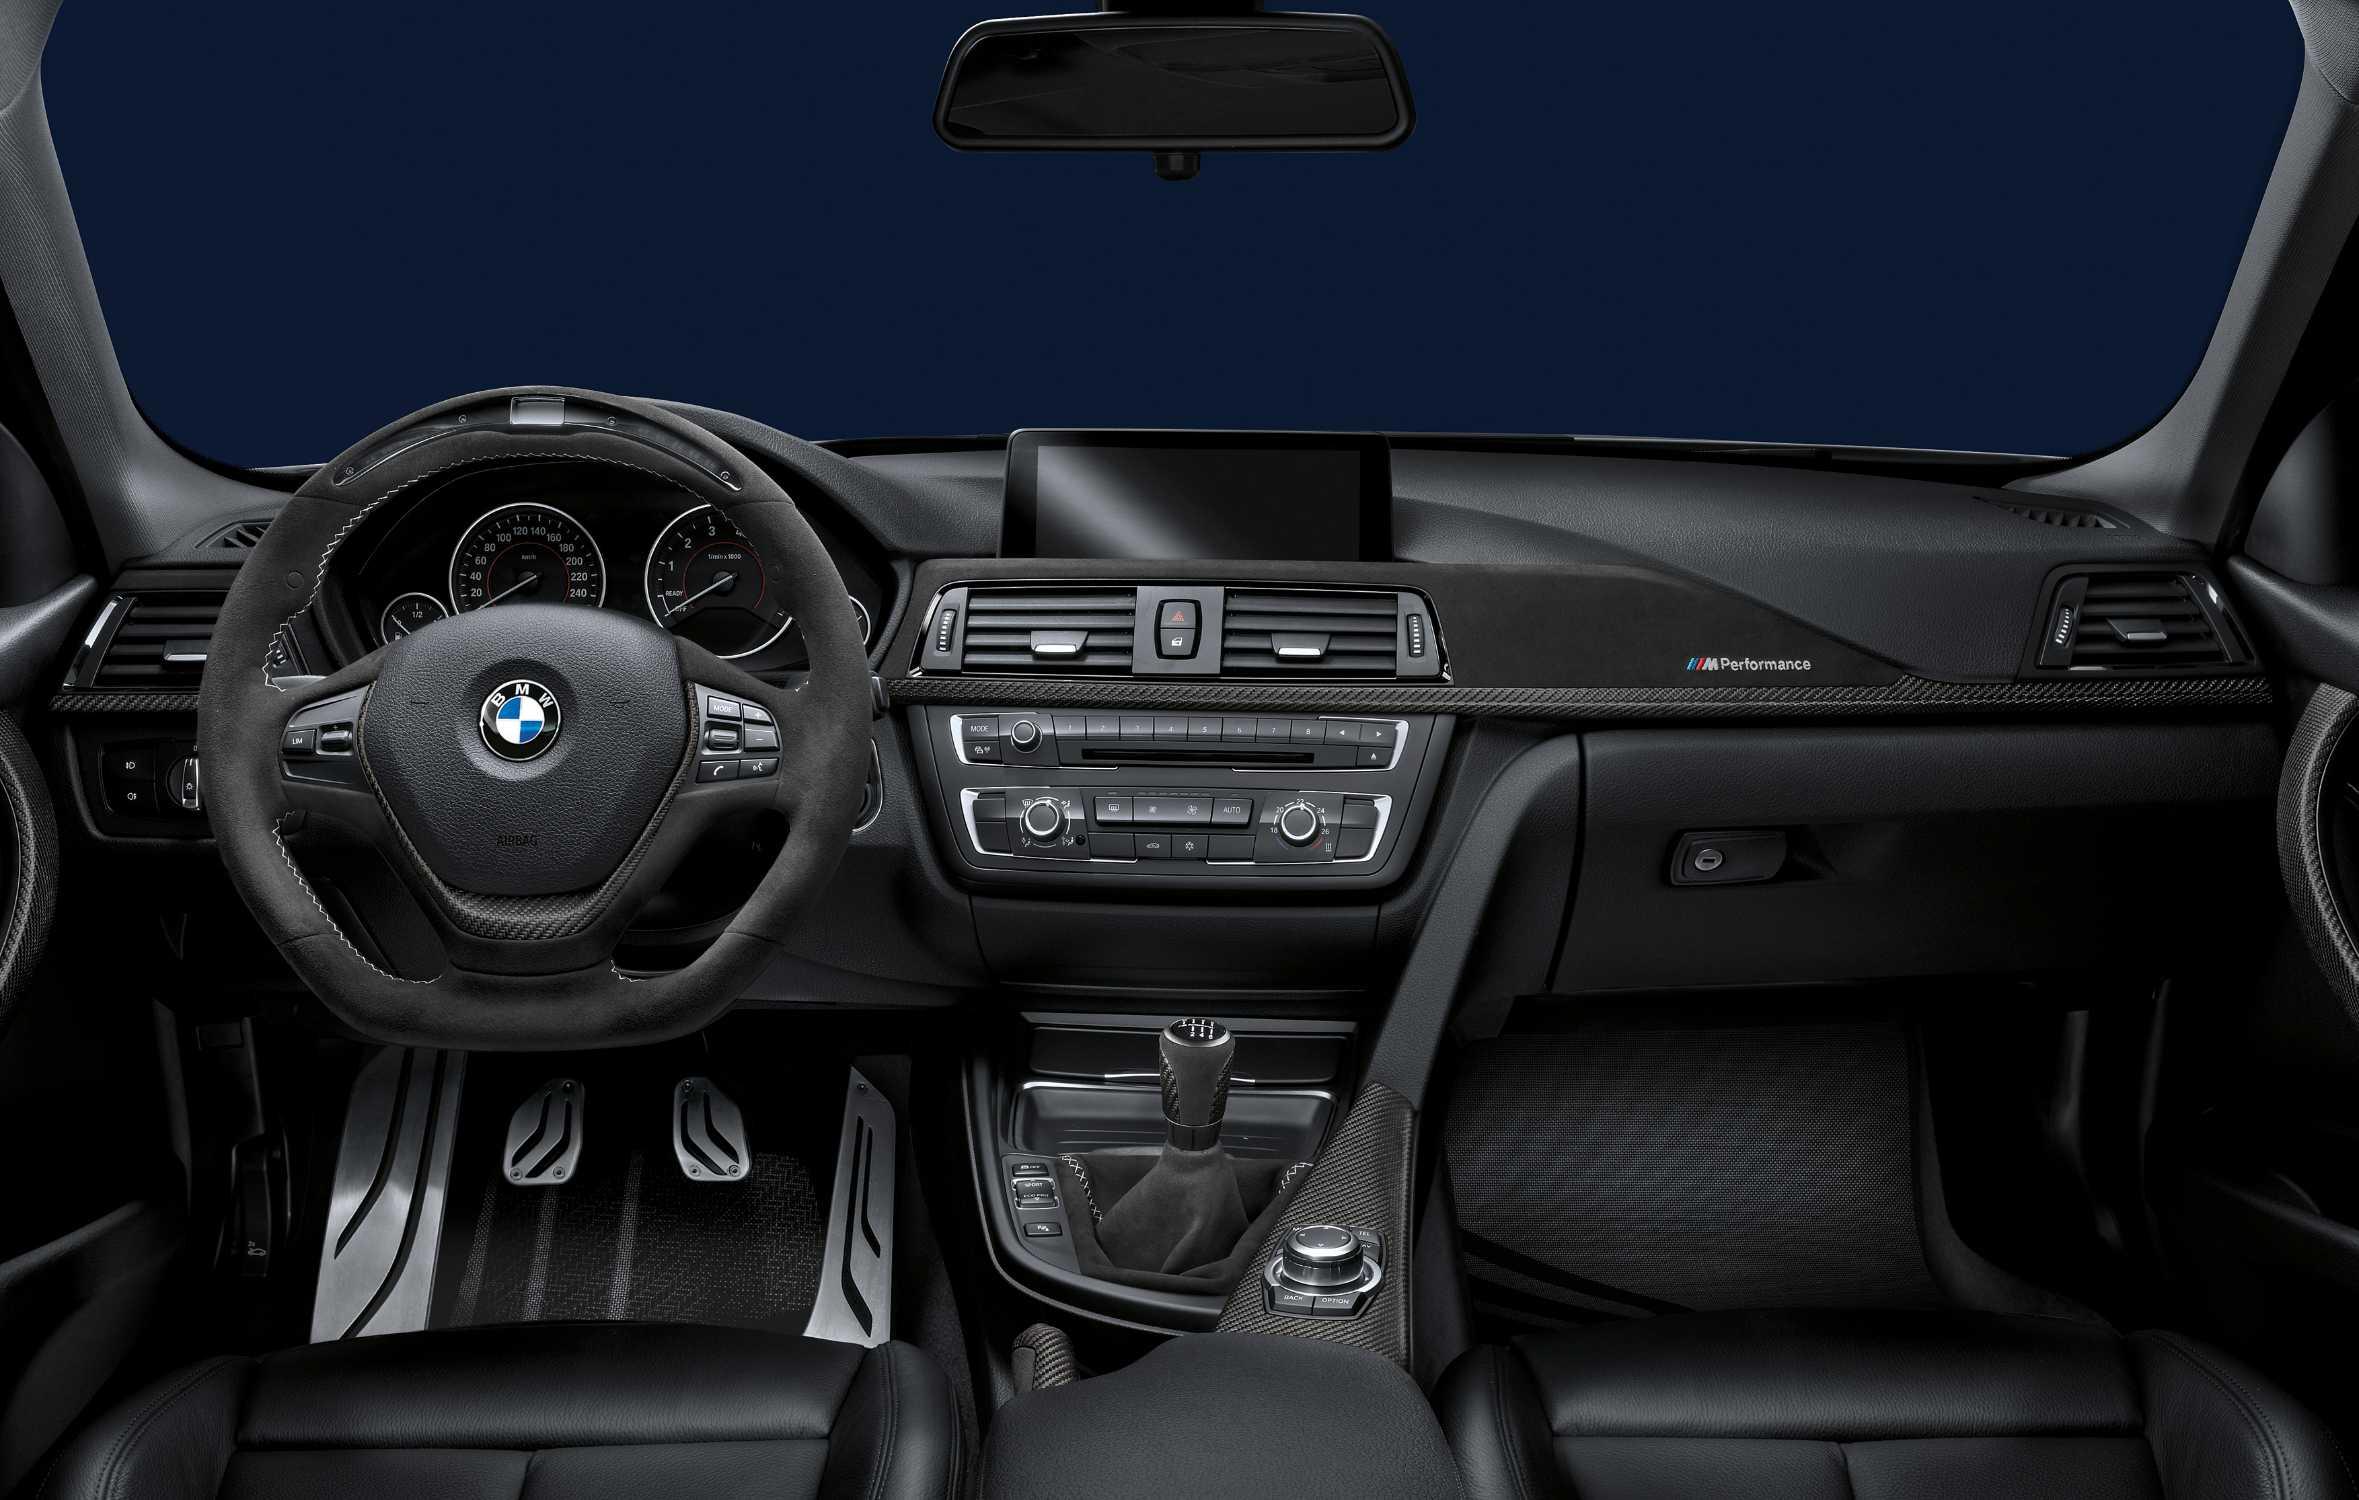 Bmw 3er Sedan With Bmw M Performance Parts Interior Bmw M